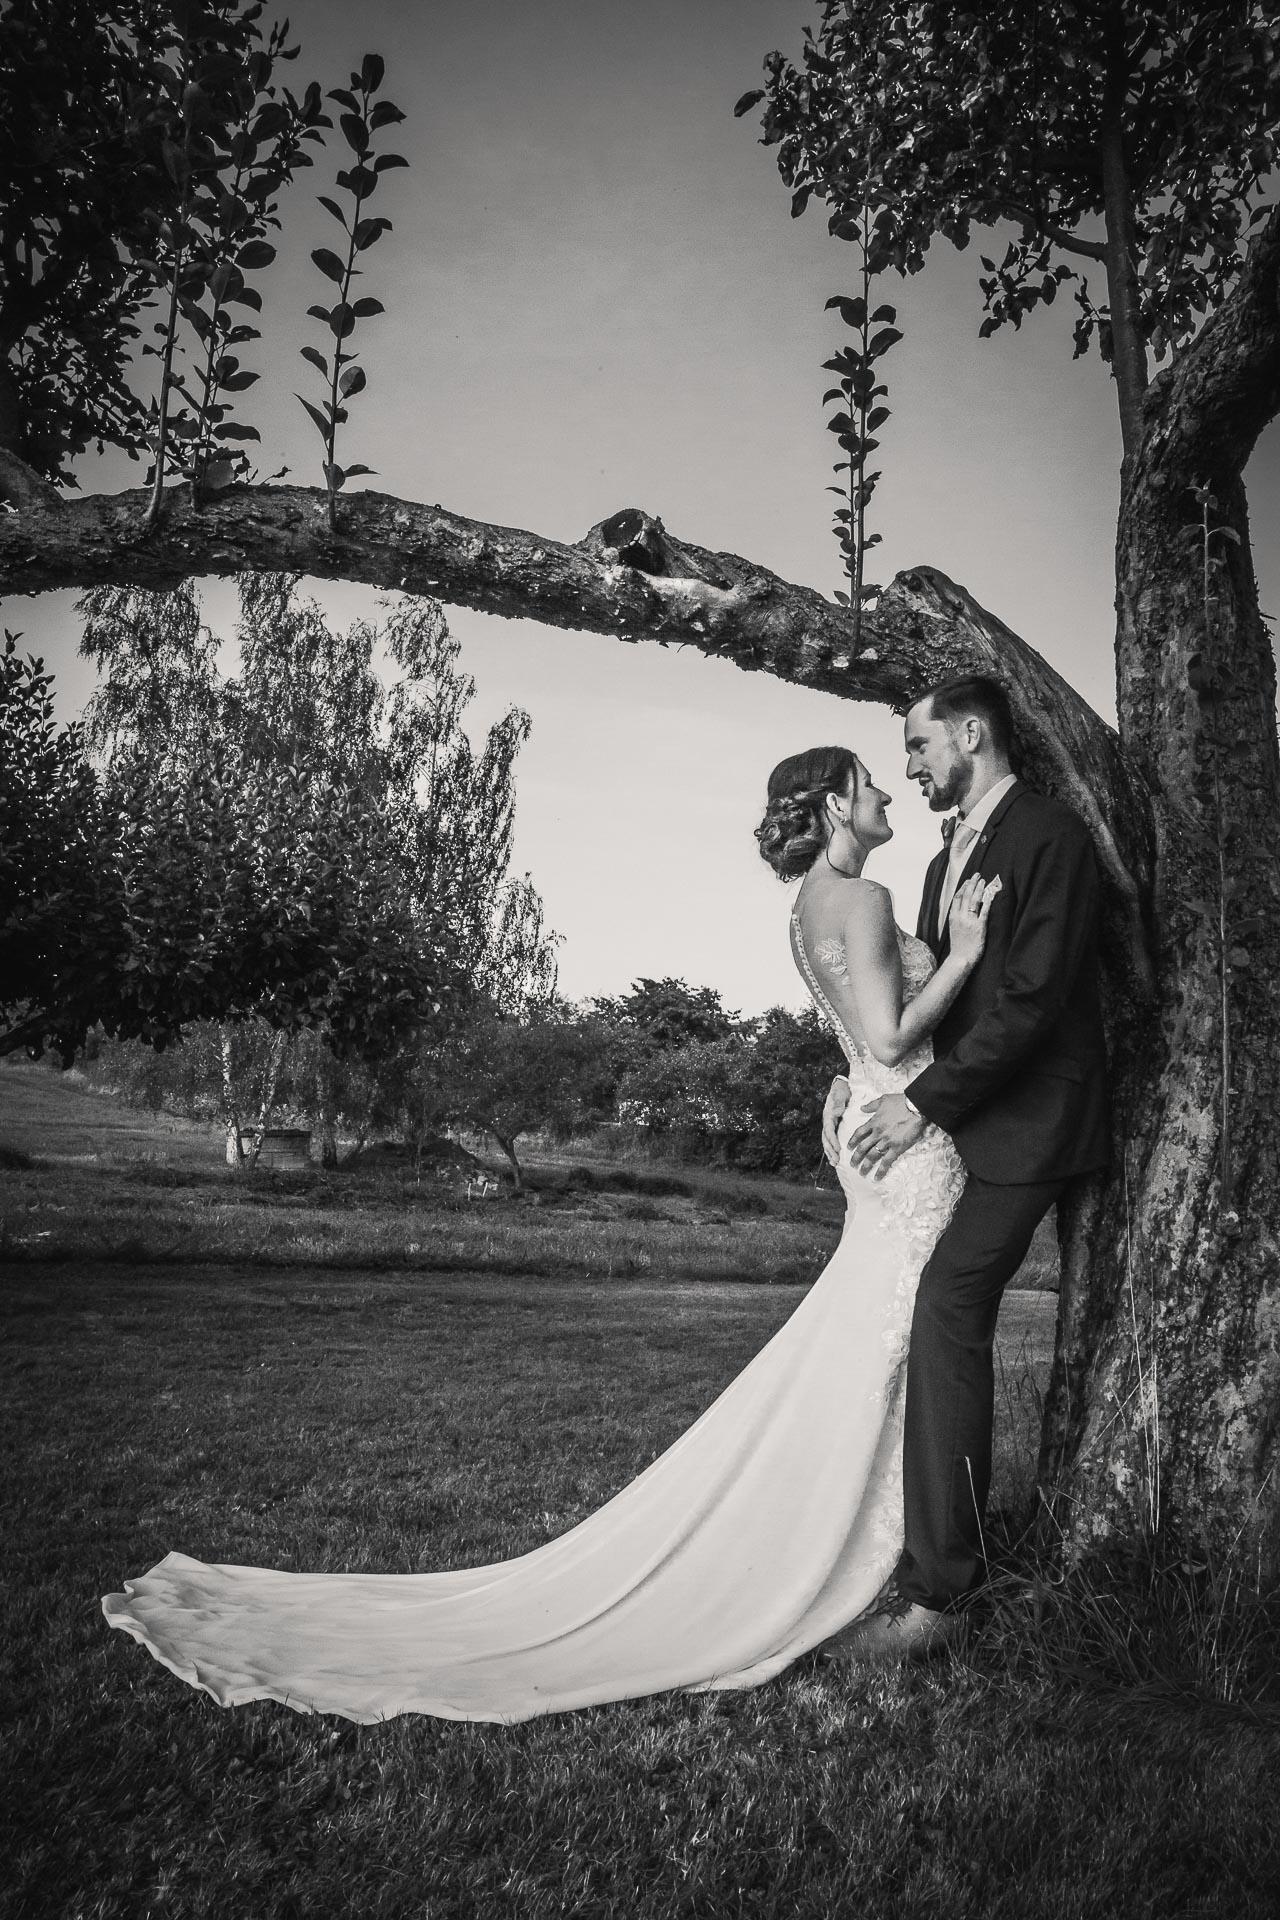 svatební-fotograf-wedding-svatebni-video-orlík-vltava-kostel-statek-stodola-boho-svatba-Beautyfoto-535